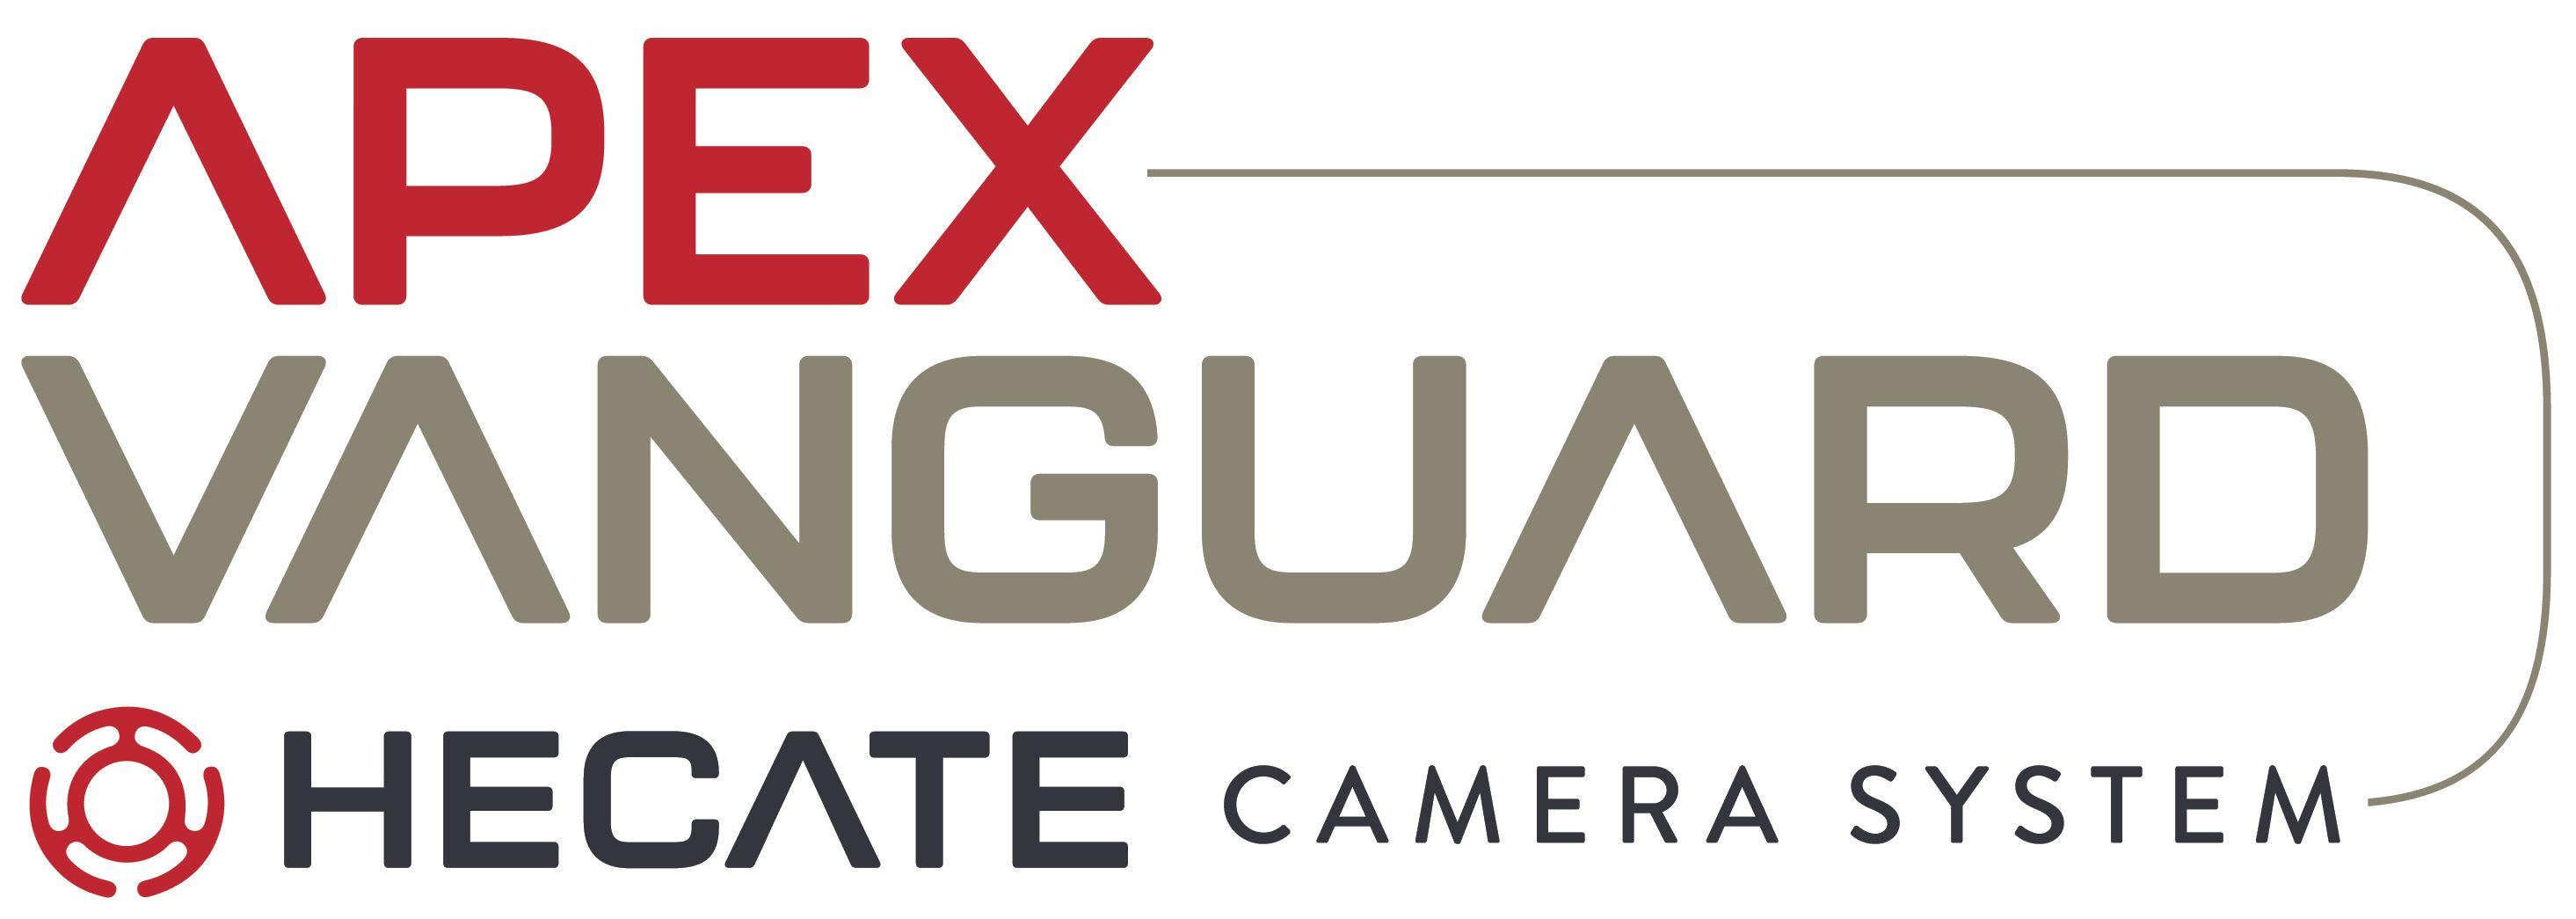 Apex Vanguard Ltd